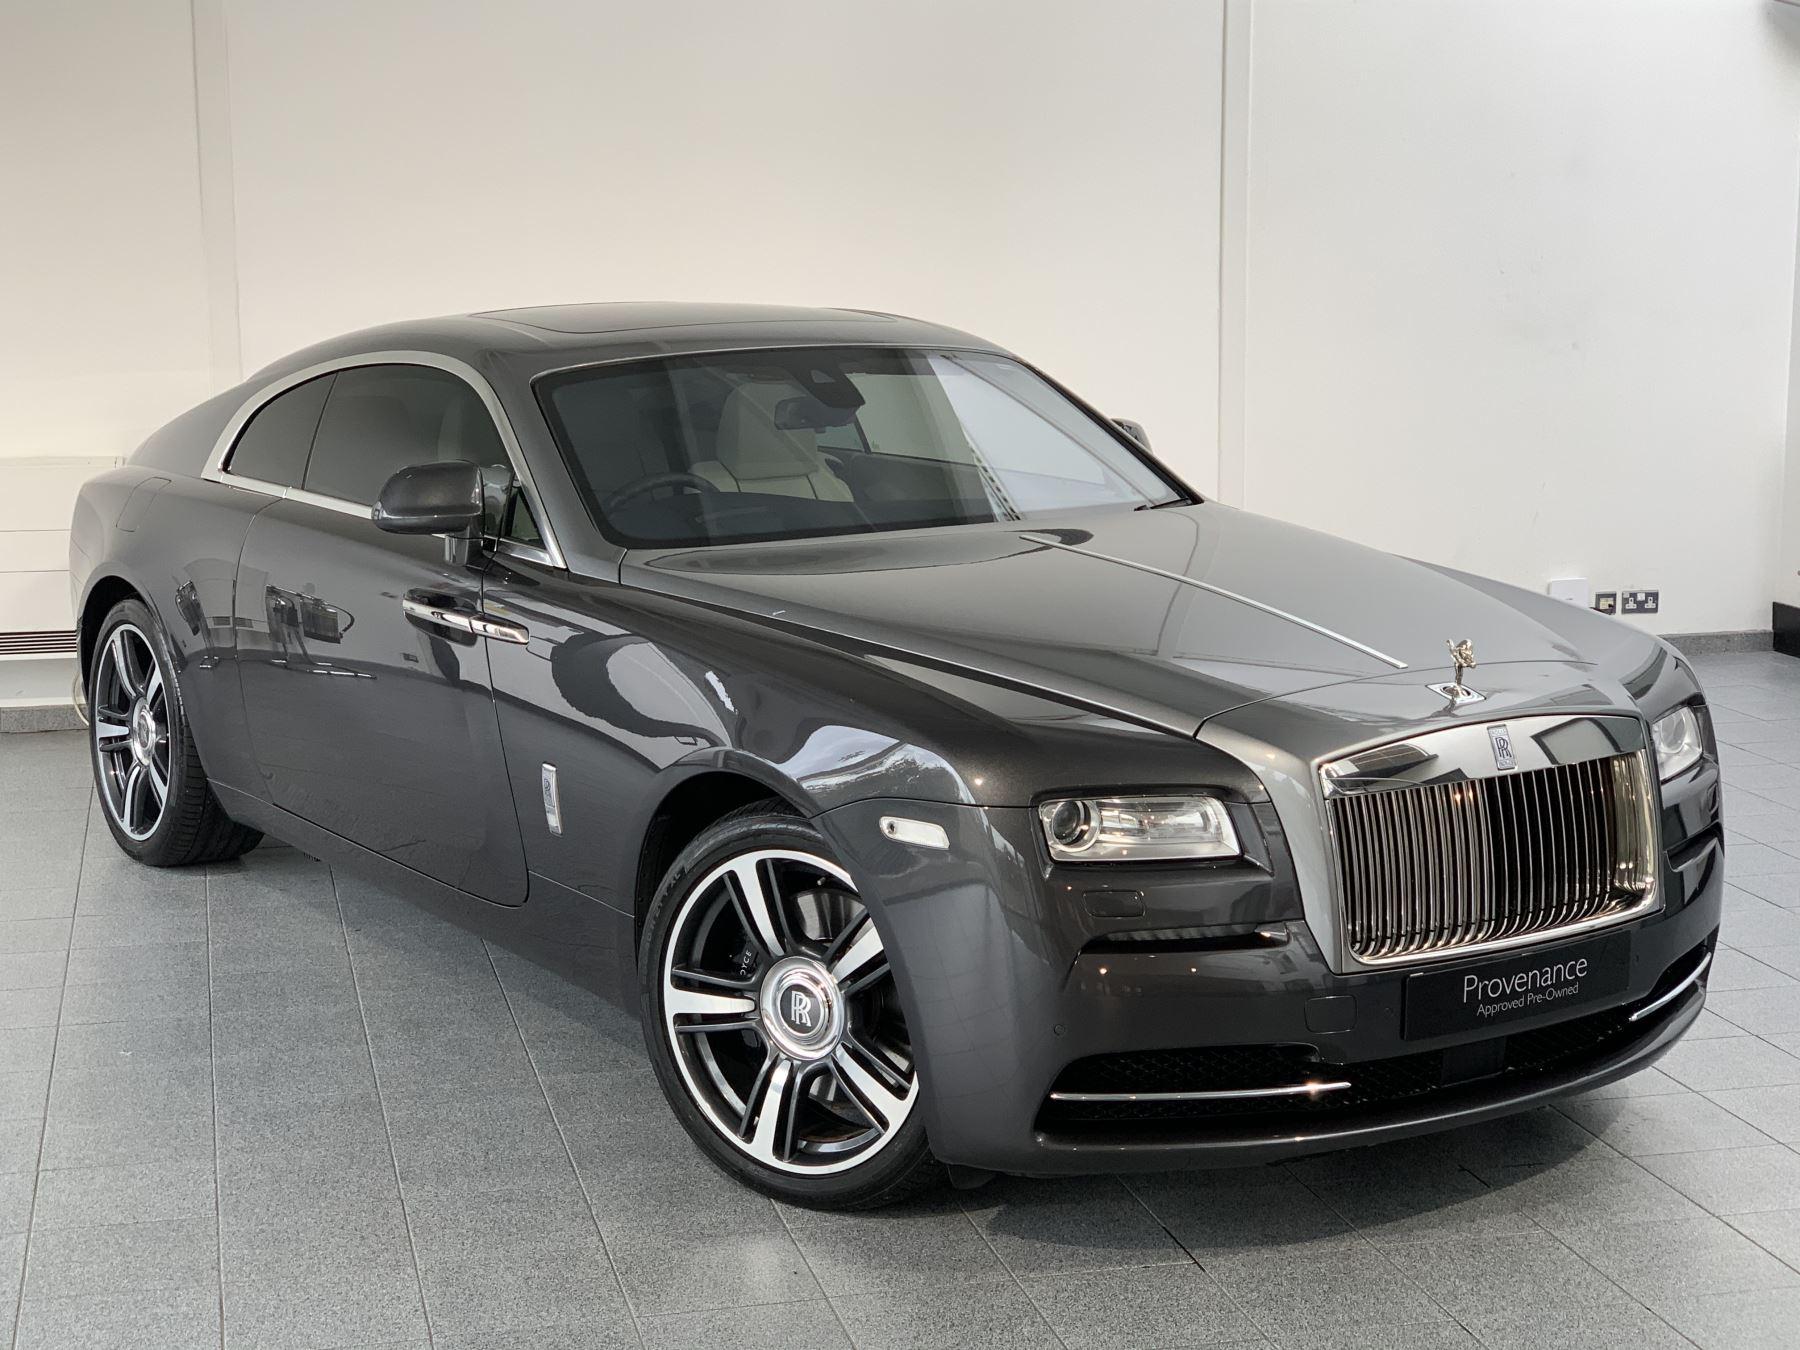 Rolls-Royce Wraith V12 2dr Auto 6.6 Automatic Coupe (2014)